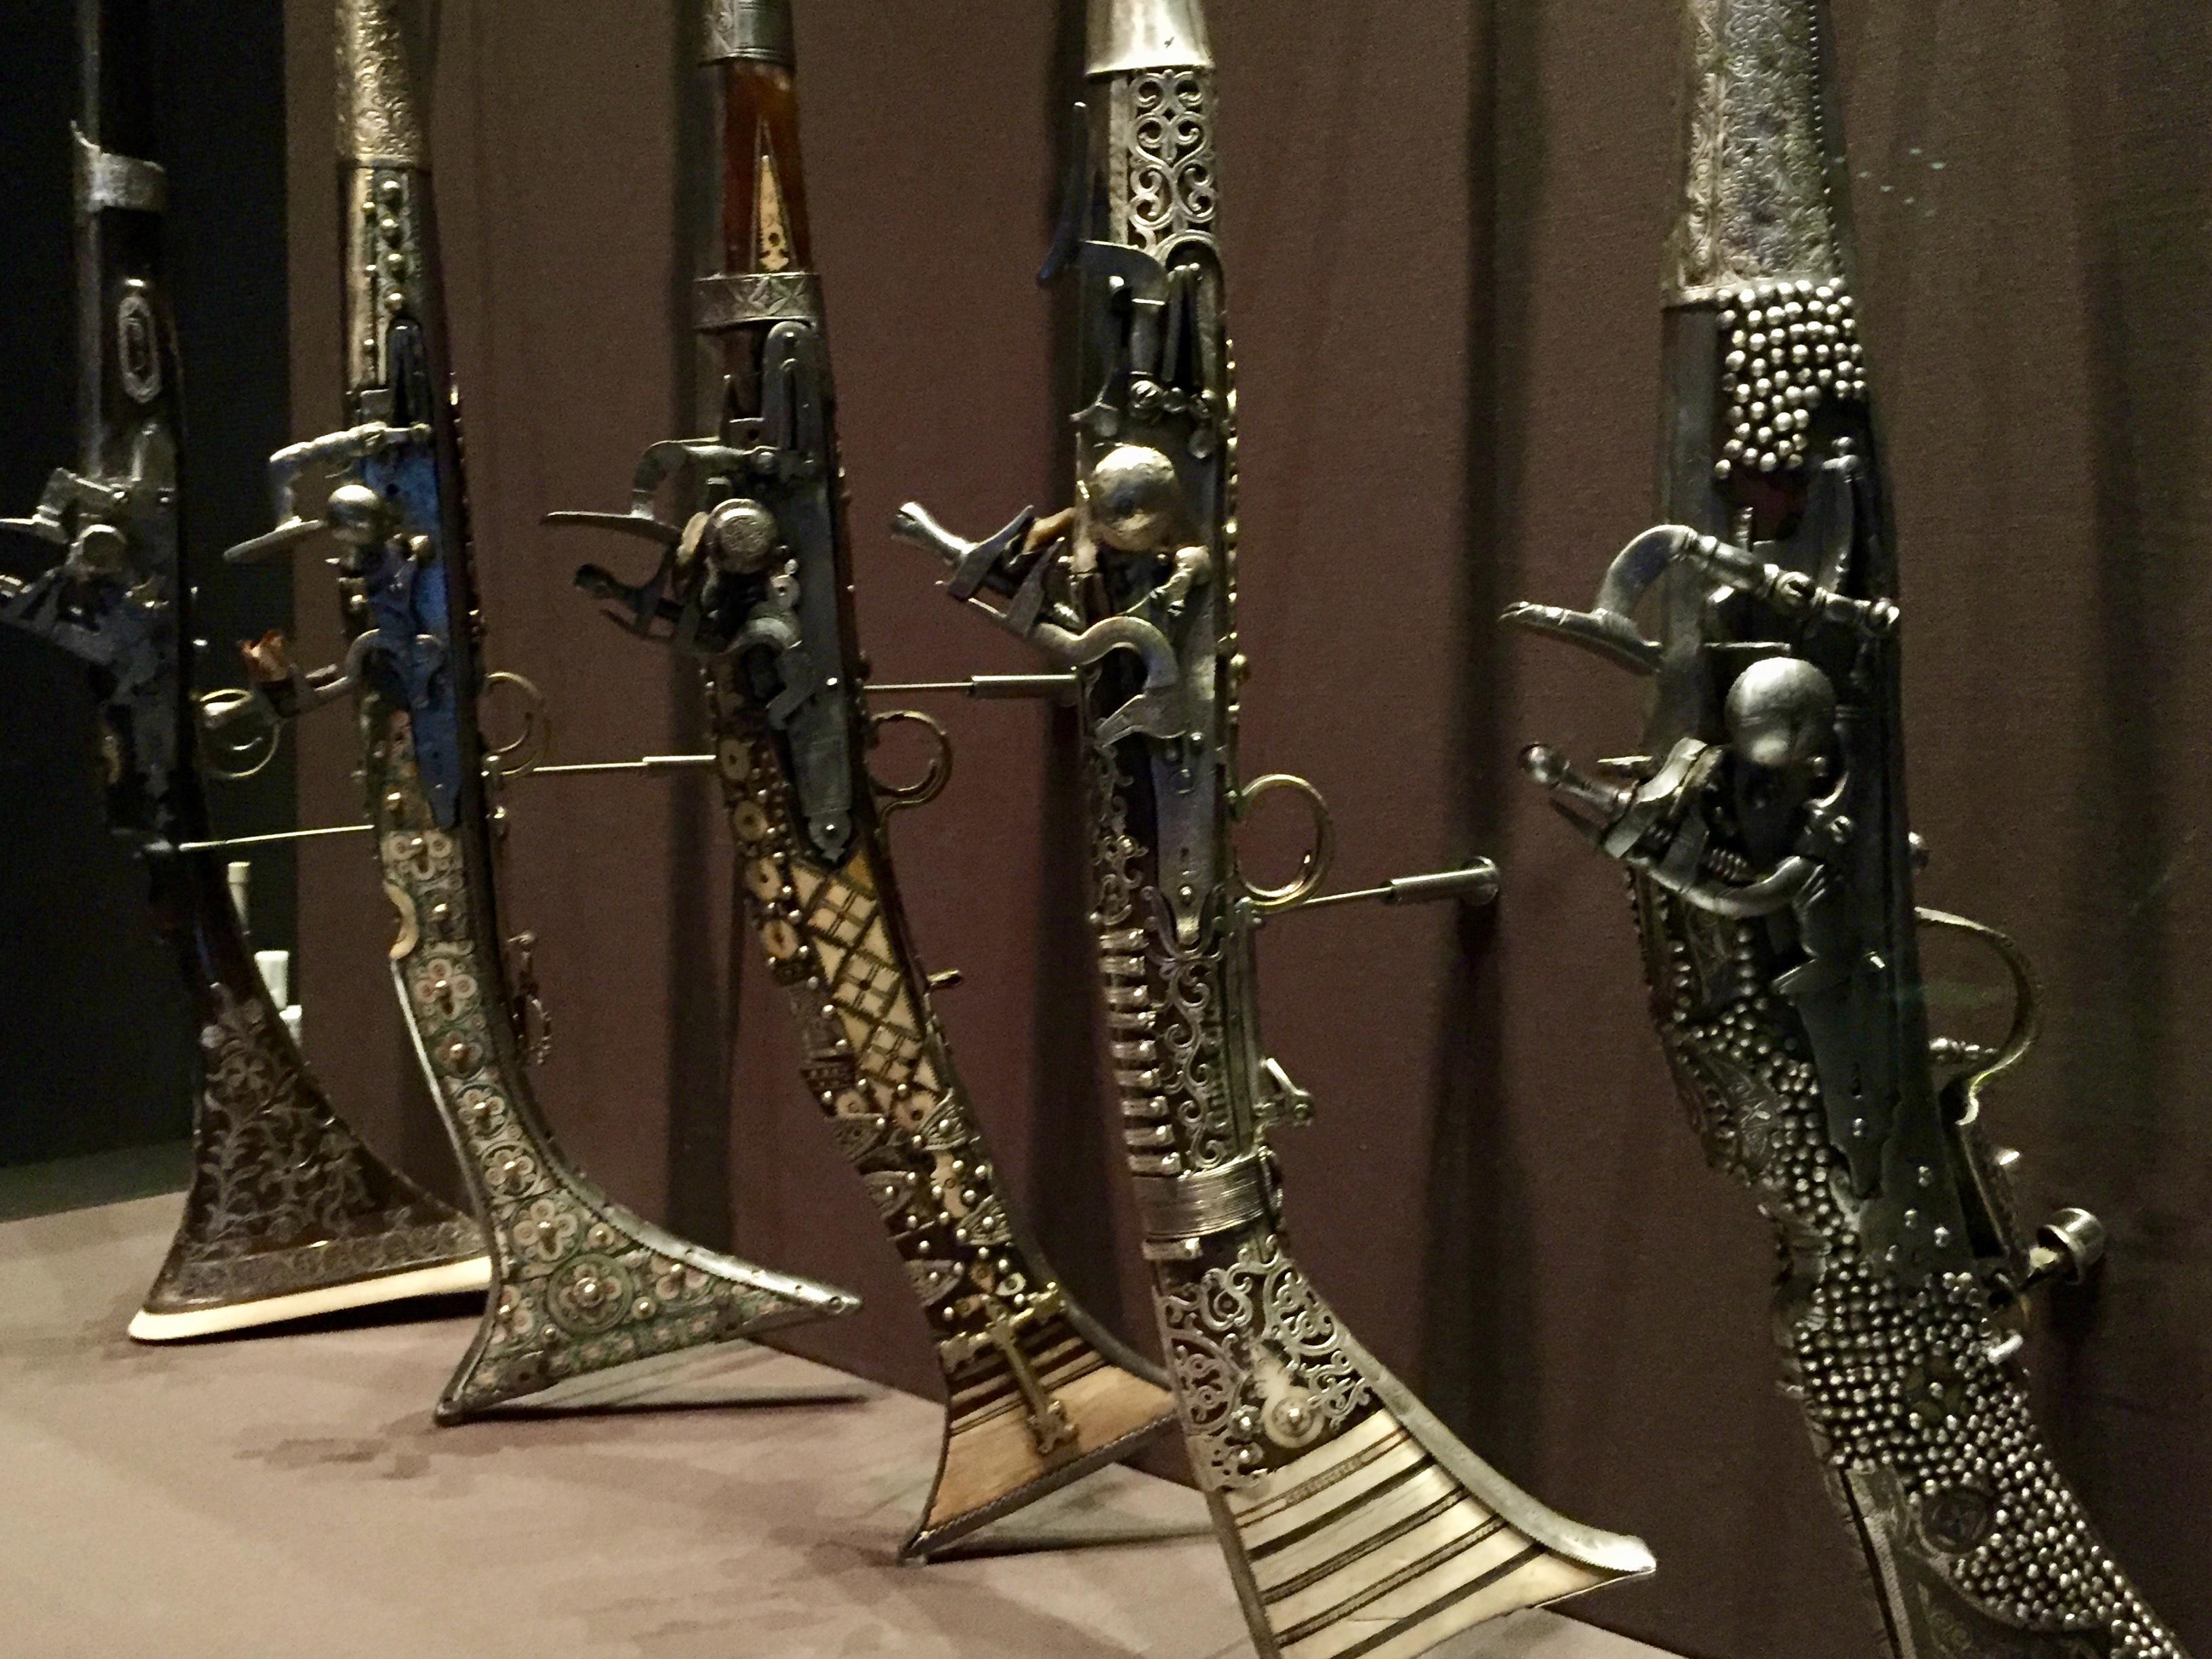 April, 2018 - Doha, Qatar - Museum of Islamic Art - Powder and Damask - Mukhala Guns - Moroccan Long-guns